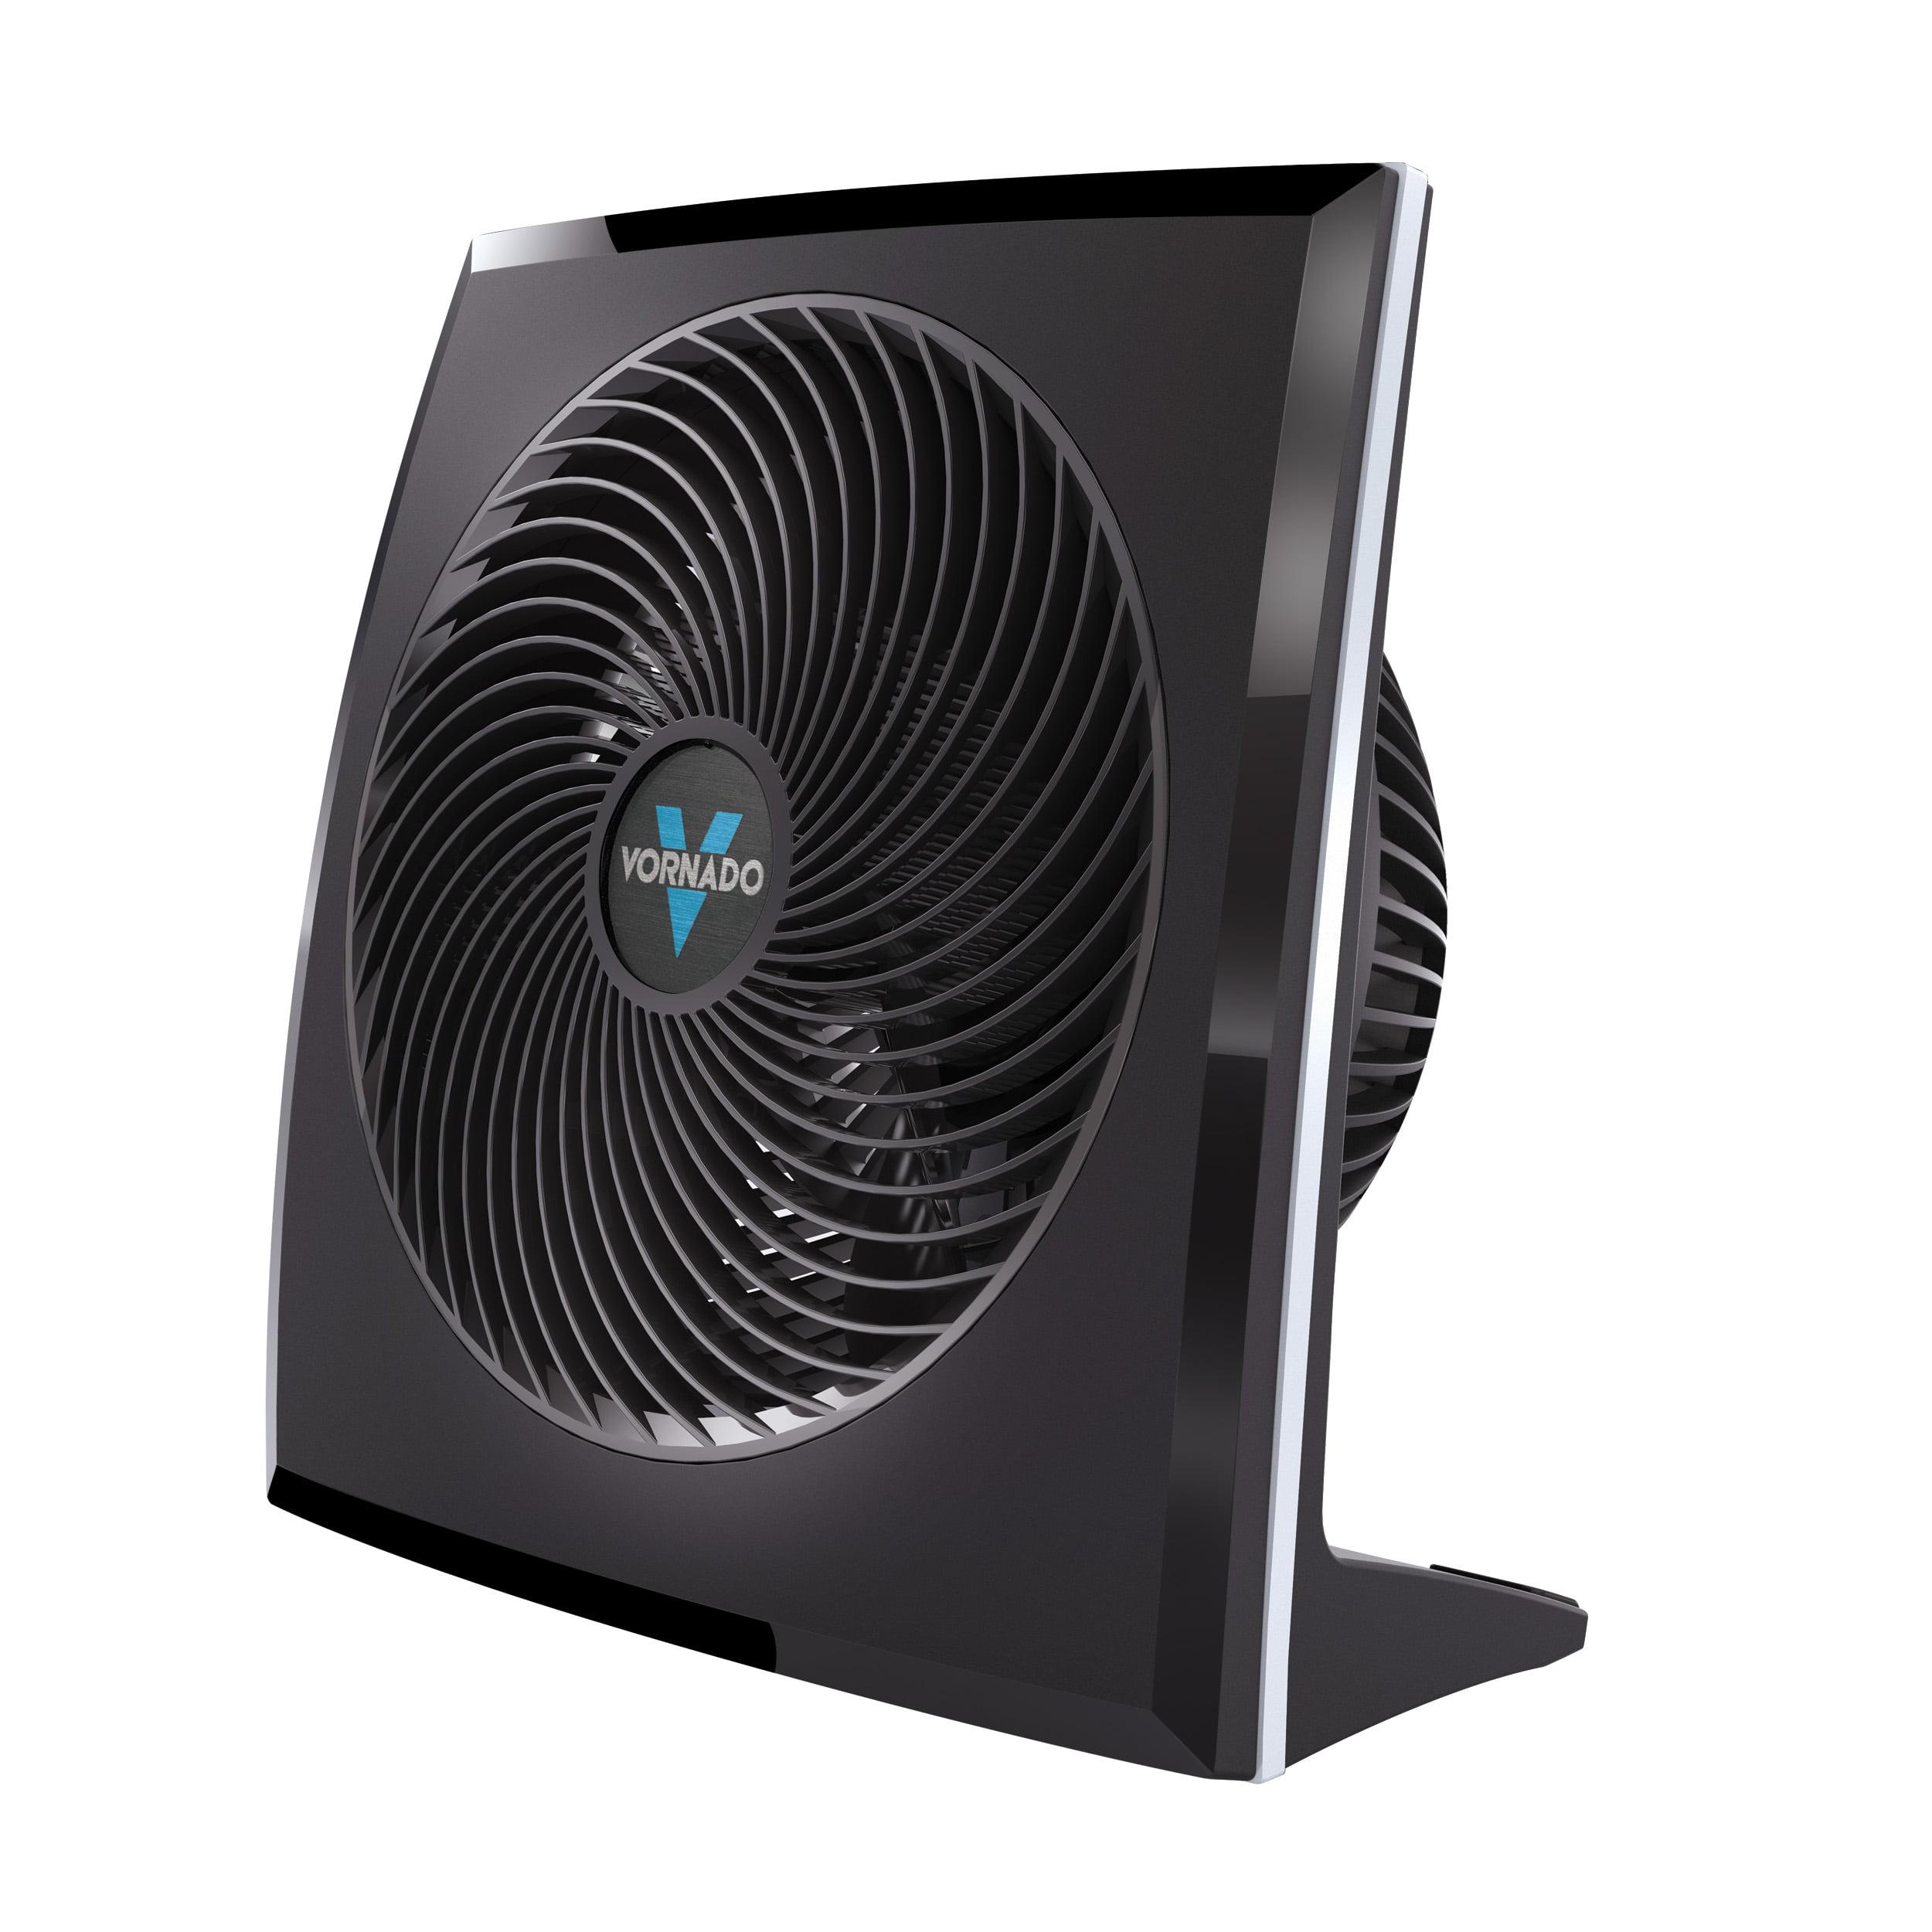 Vornado 270 Large Panel Whole Room Air Circulator Fan